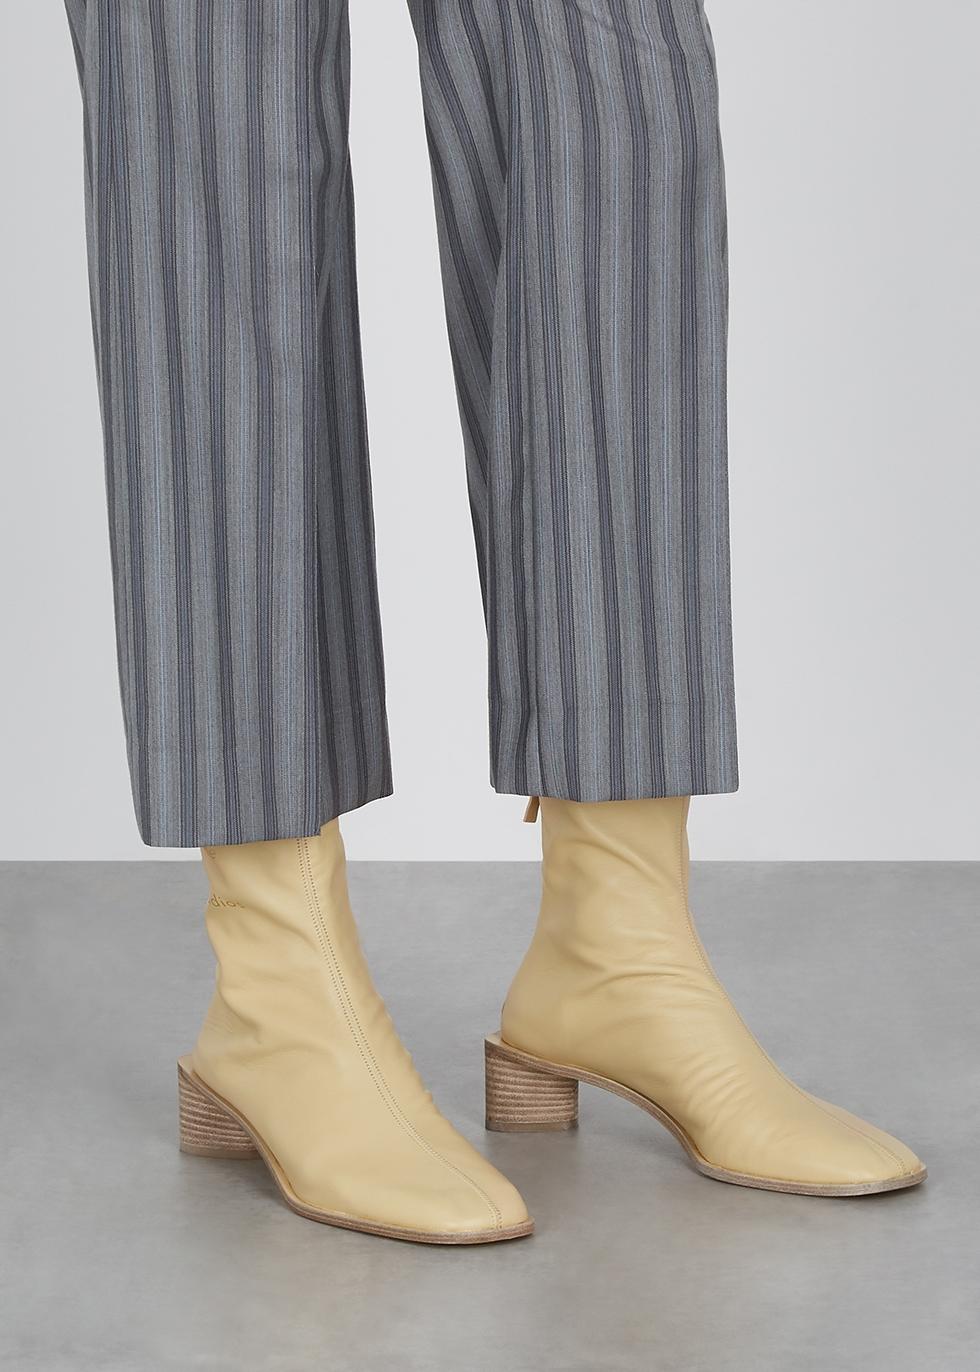 Acne Studios 45 sand leather ankle